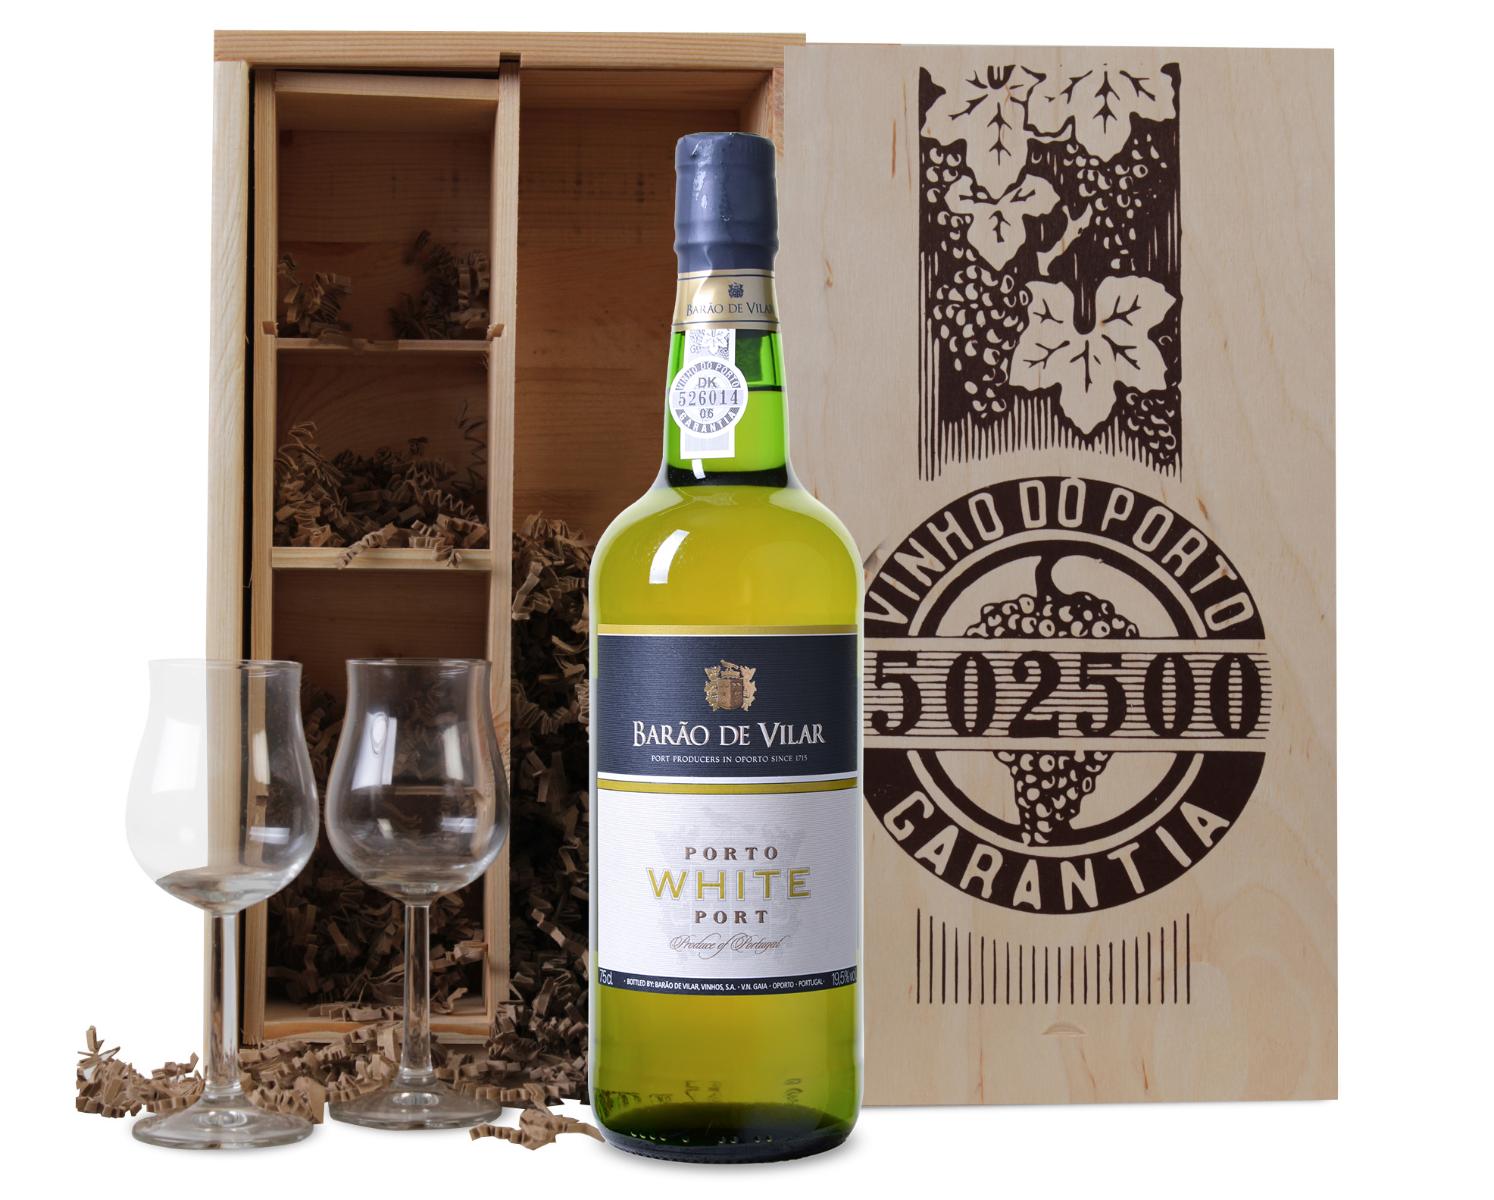 Image of Barão de Vilar sweet White port + 2 glazen in luxe portkist